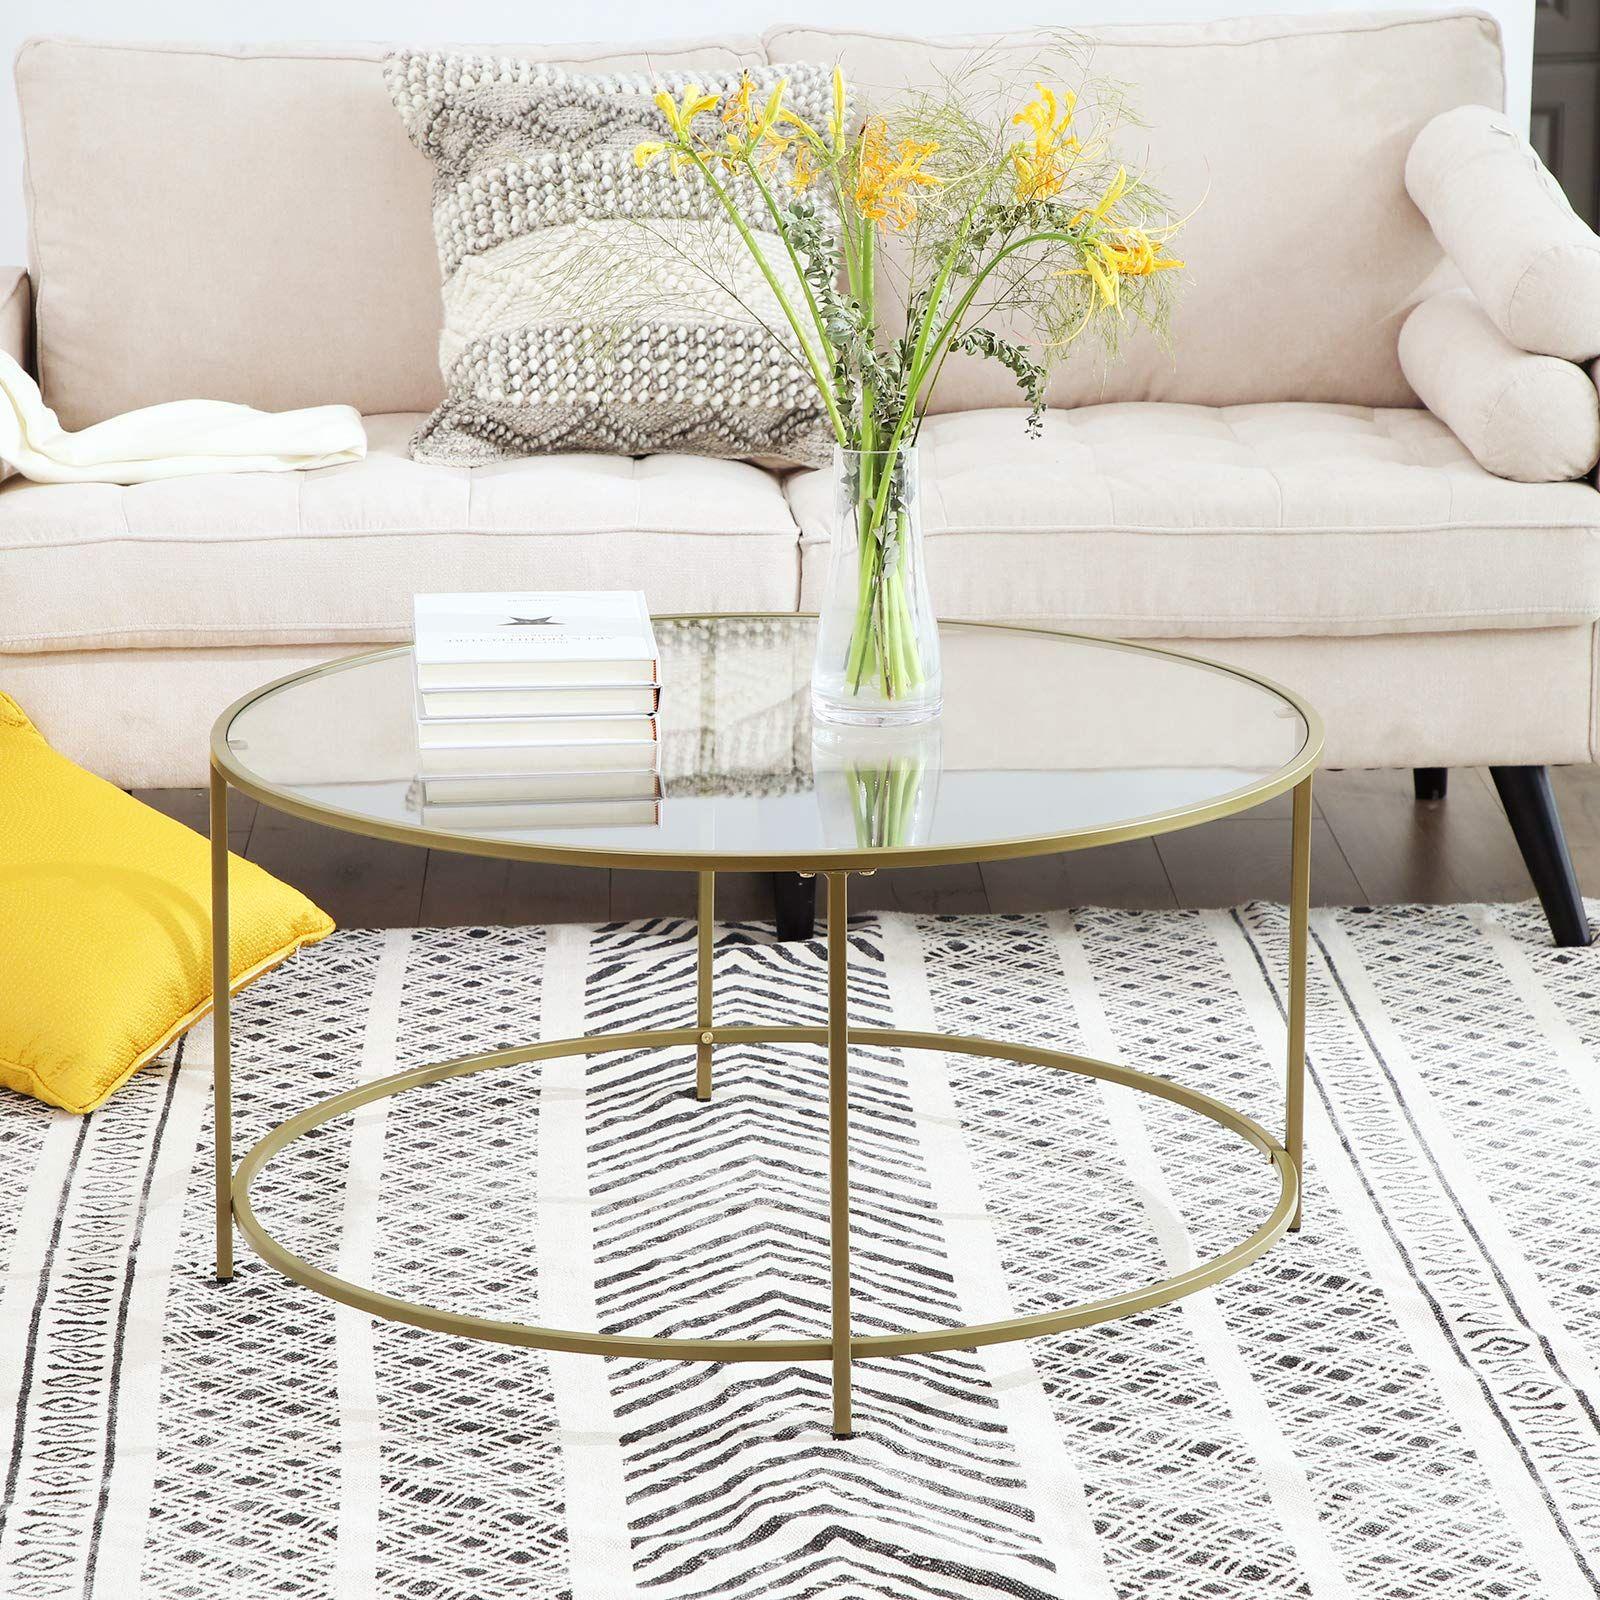 Vasagle Coffee Tempered Decorative Ulgt21g Round Glass Coffee Table Coffee Table Living Room Table [ 1600 x 1600 Pixel ]